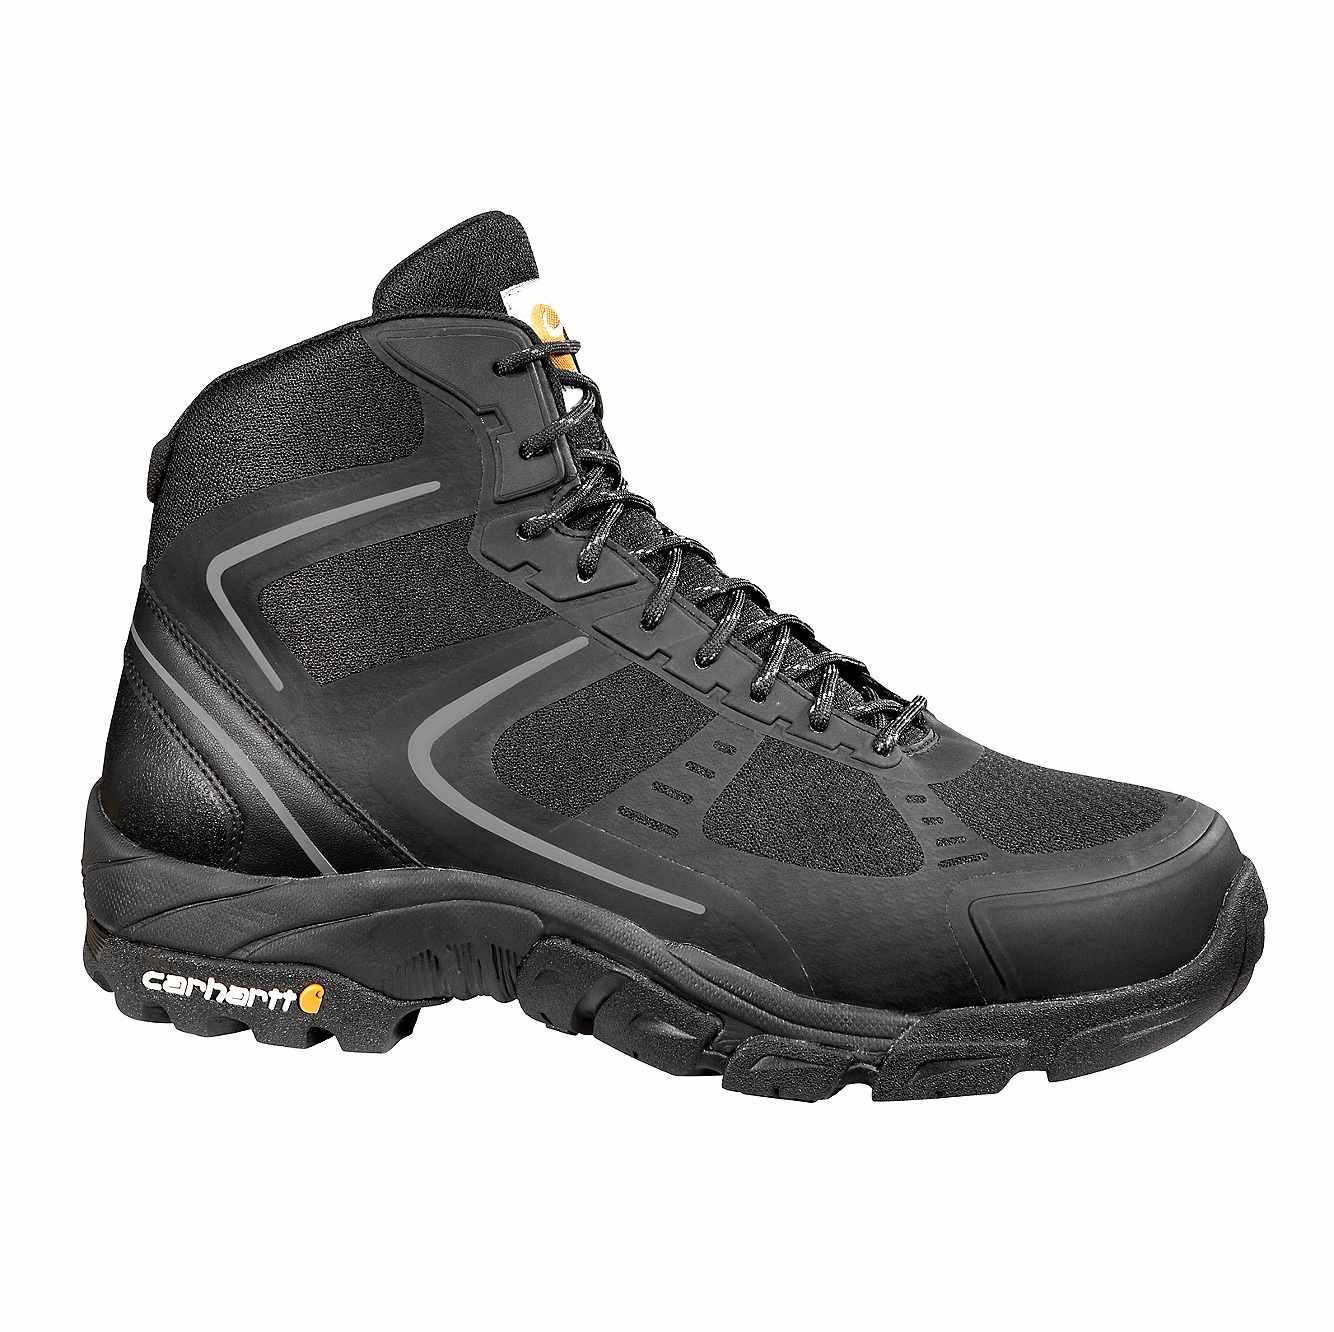 Picture of Lightweight Steel Toe Work Hiker Boot in Black